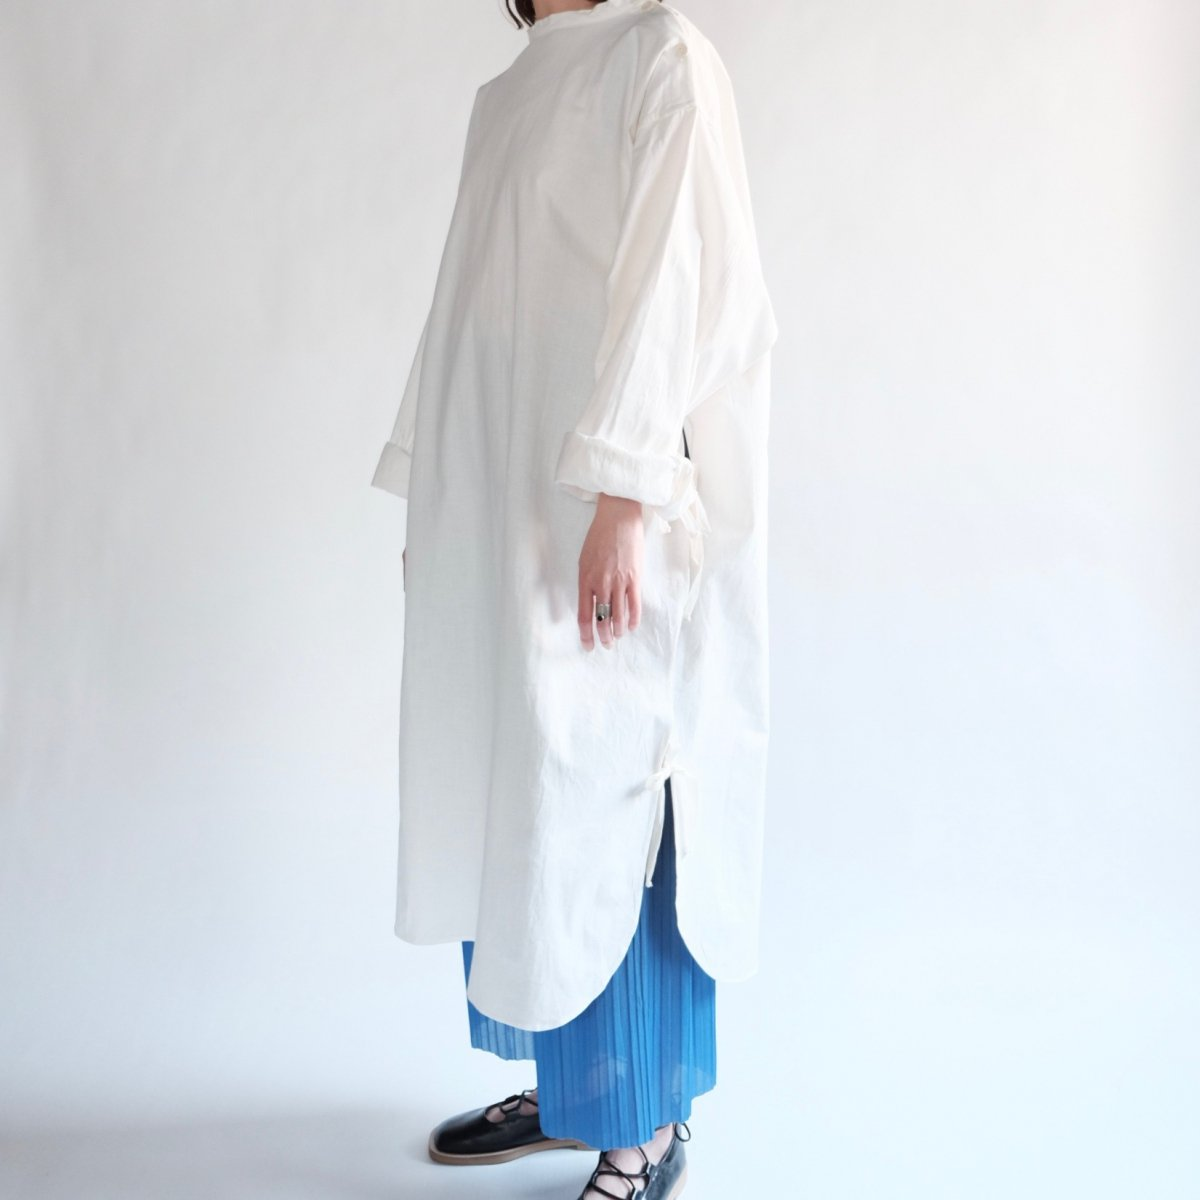 [VINTAGE] Side Ribboned Long Sleeve Medical Shirt